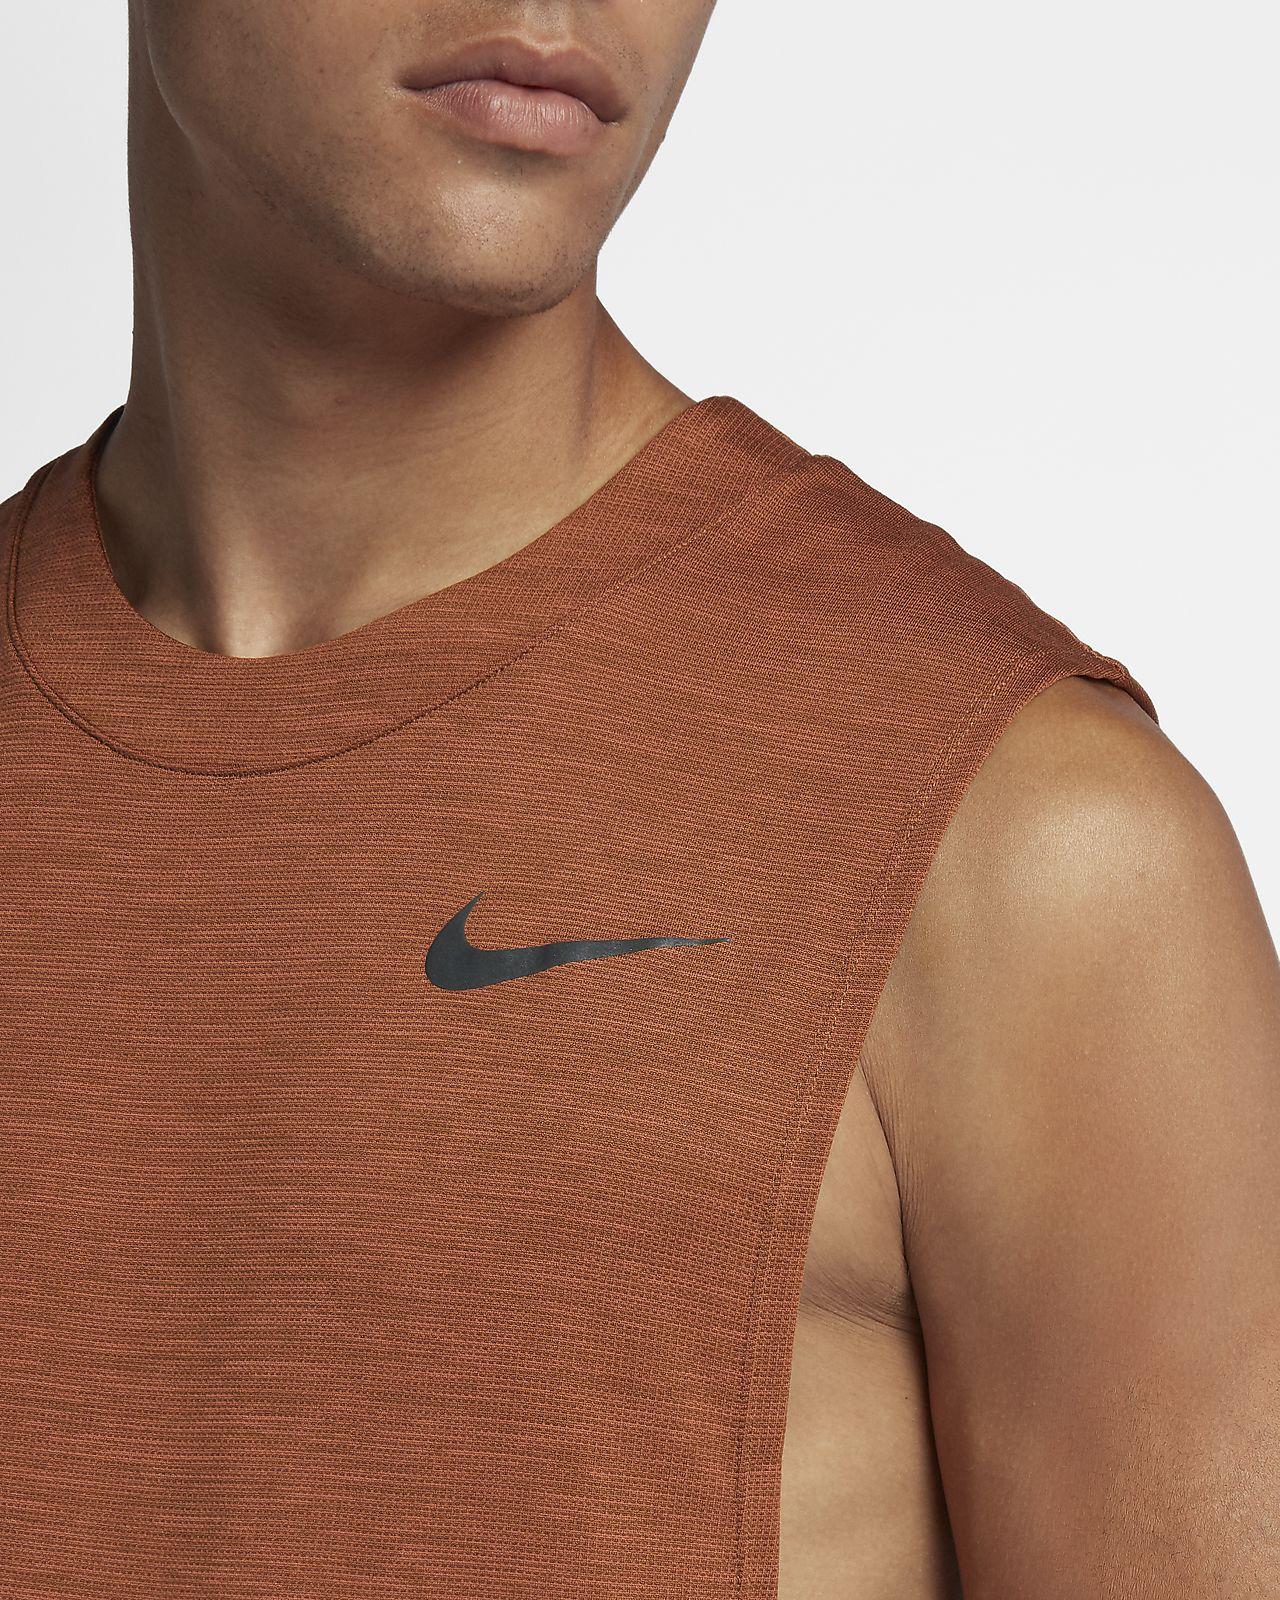 ce825bf67dc8a3 Nike Medalist Run Division Men s Sleeveless Running Top. Nike.com NZ